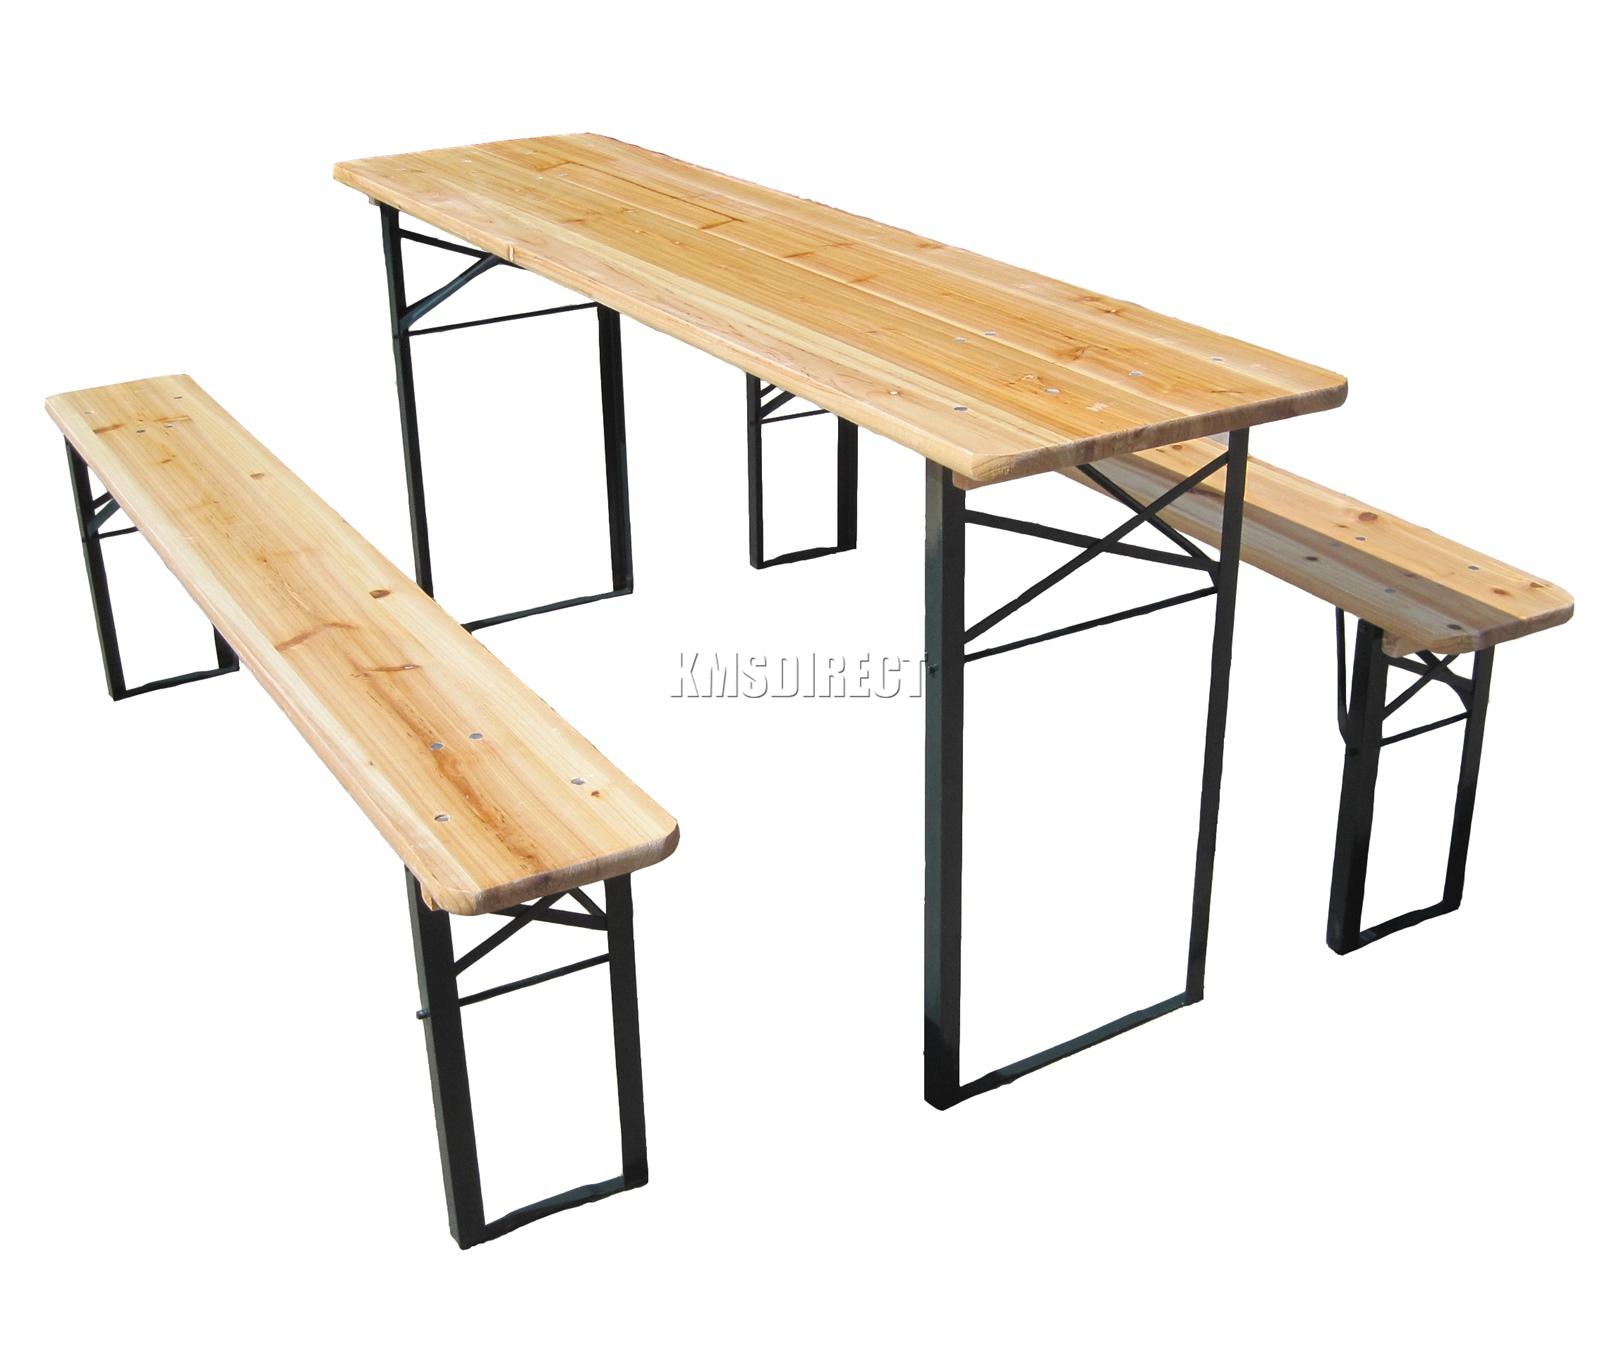 Details About Westwood Outdoor Wooden Folding Beer Table Bench Set Trestle Garden Steel Leg inside dimensions 1600 X 1350